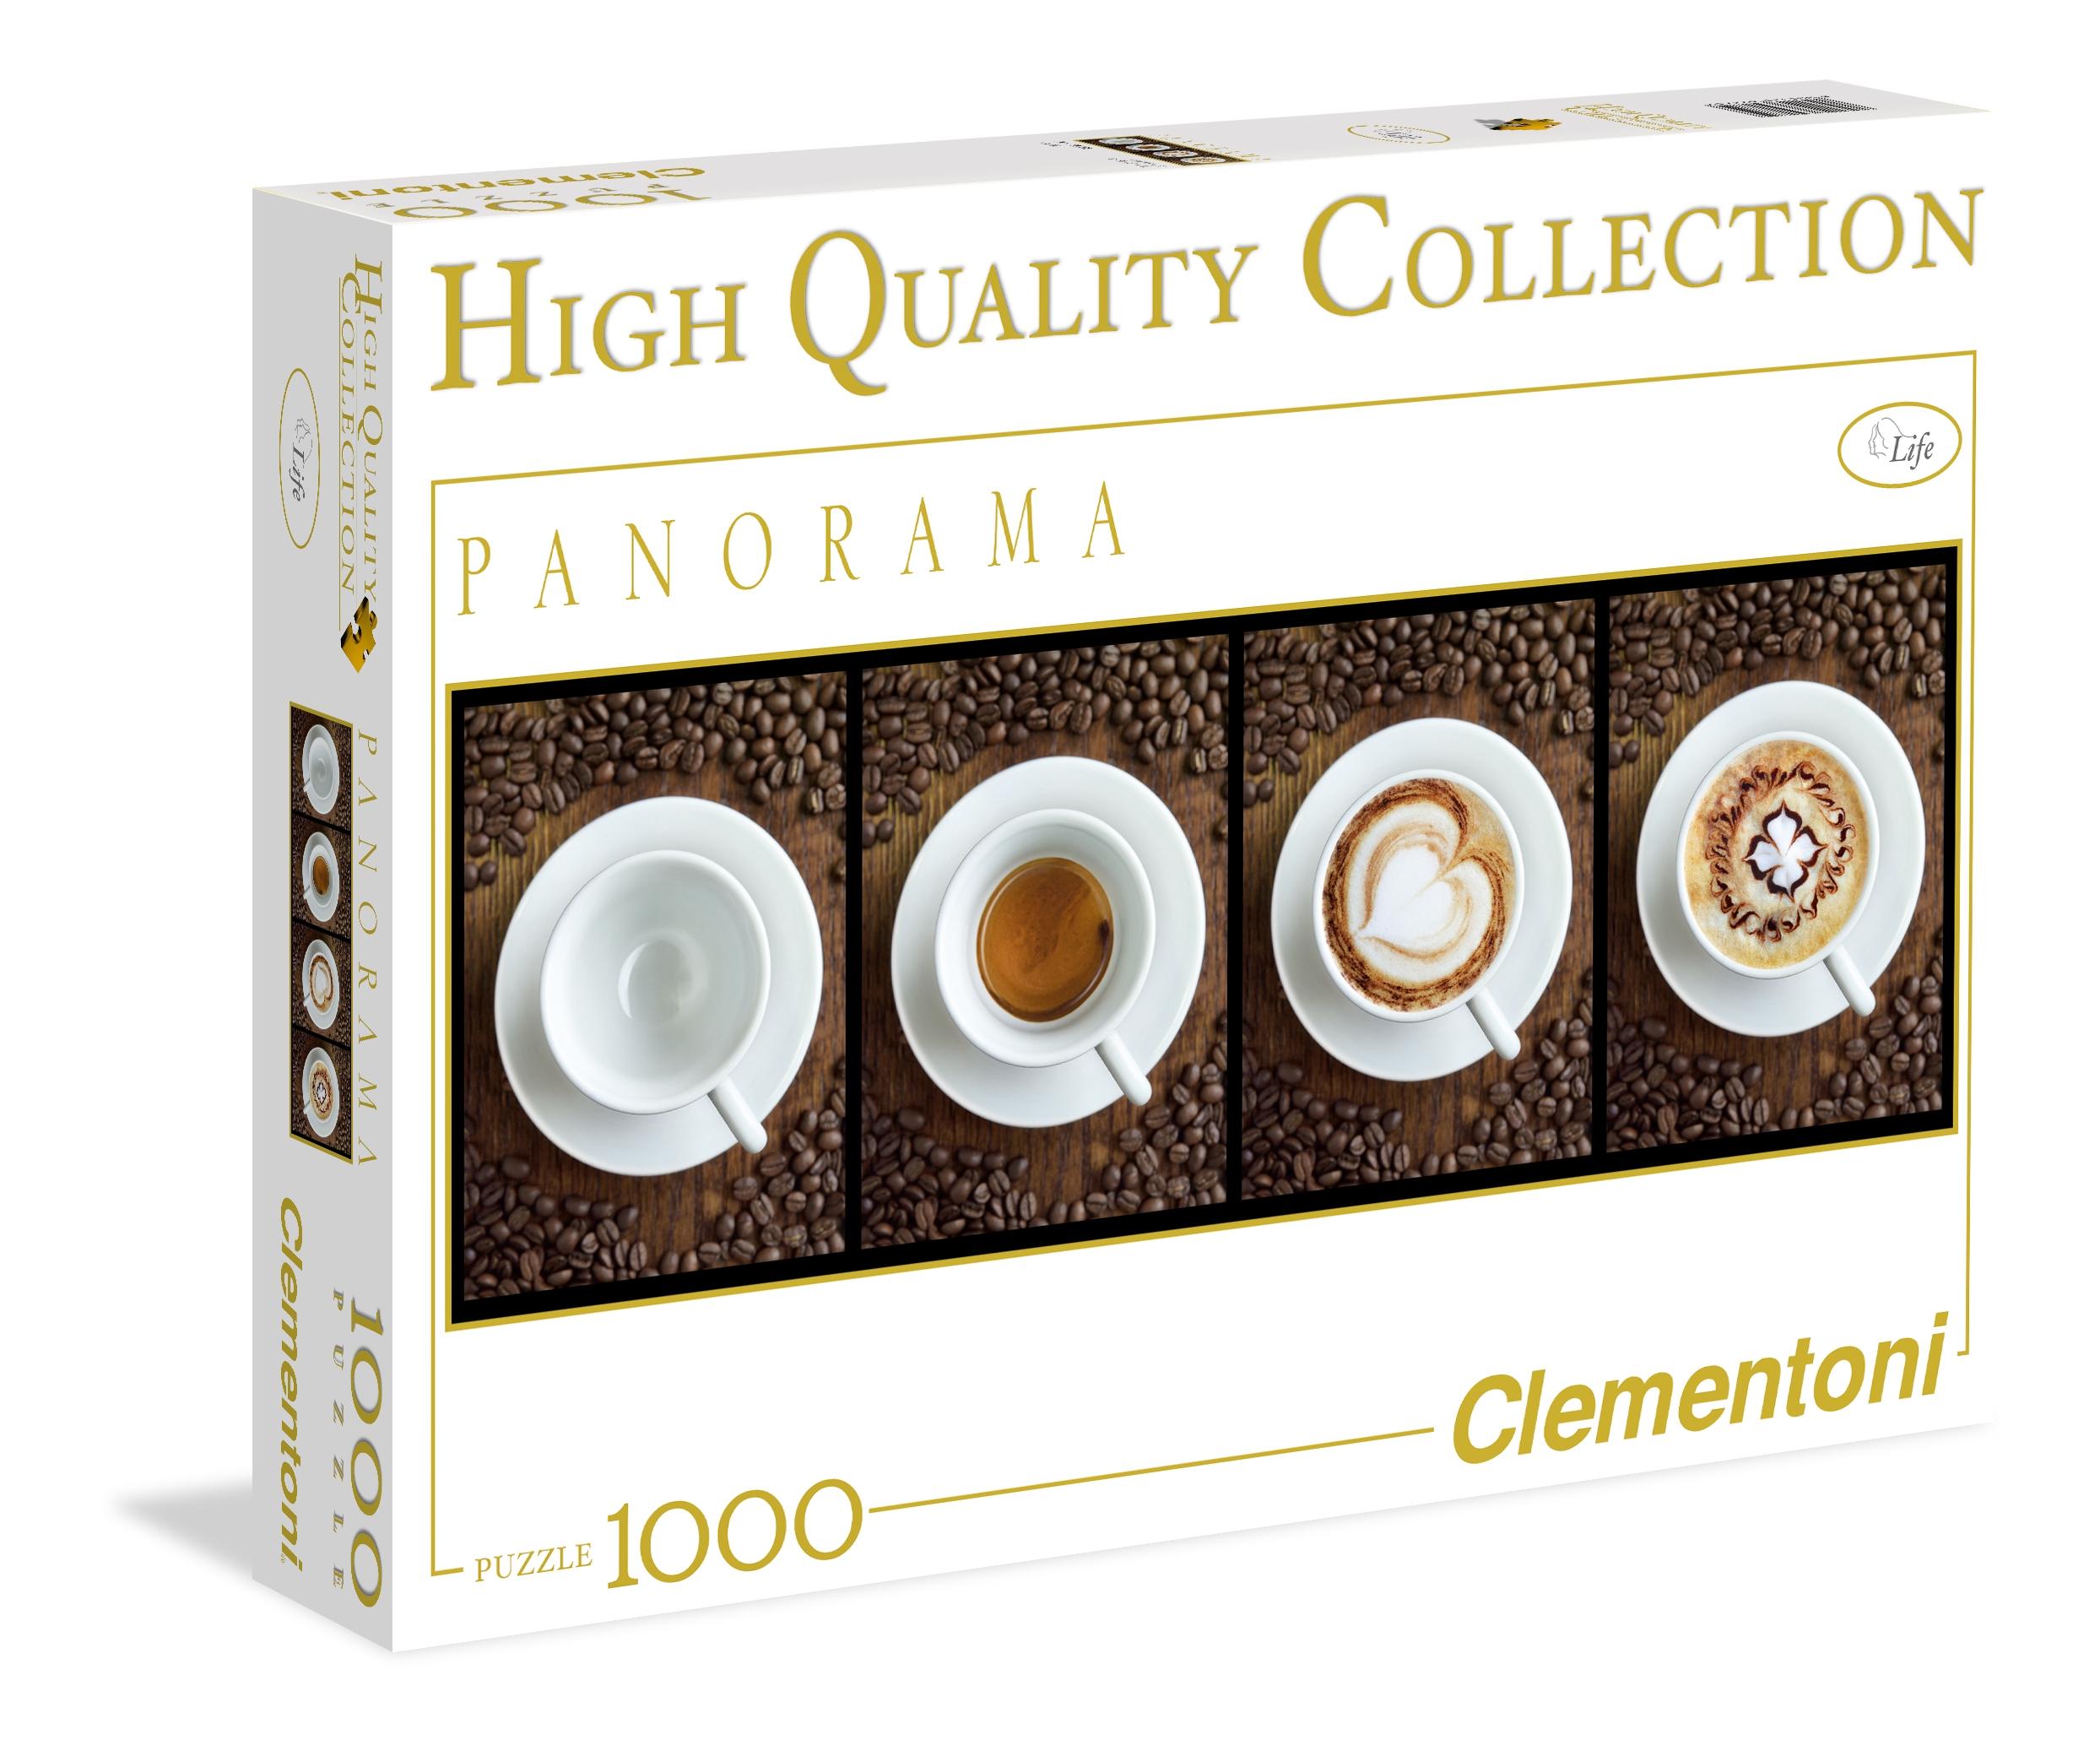 Puzzle Clementoni Tazas de Café de 1000 Piezas